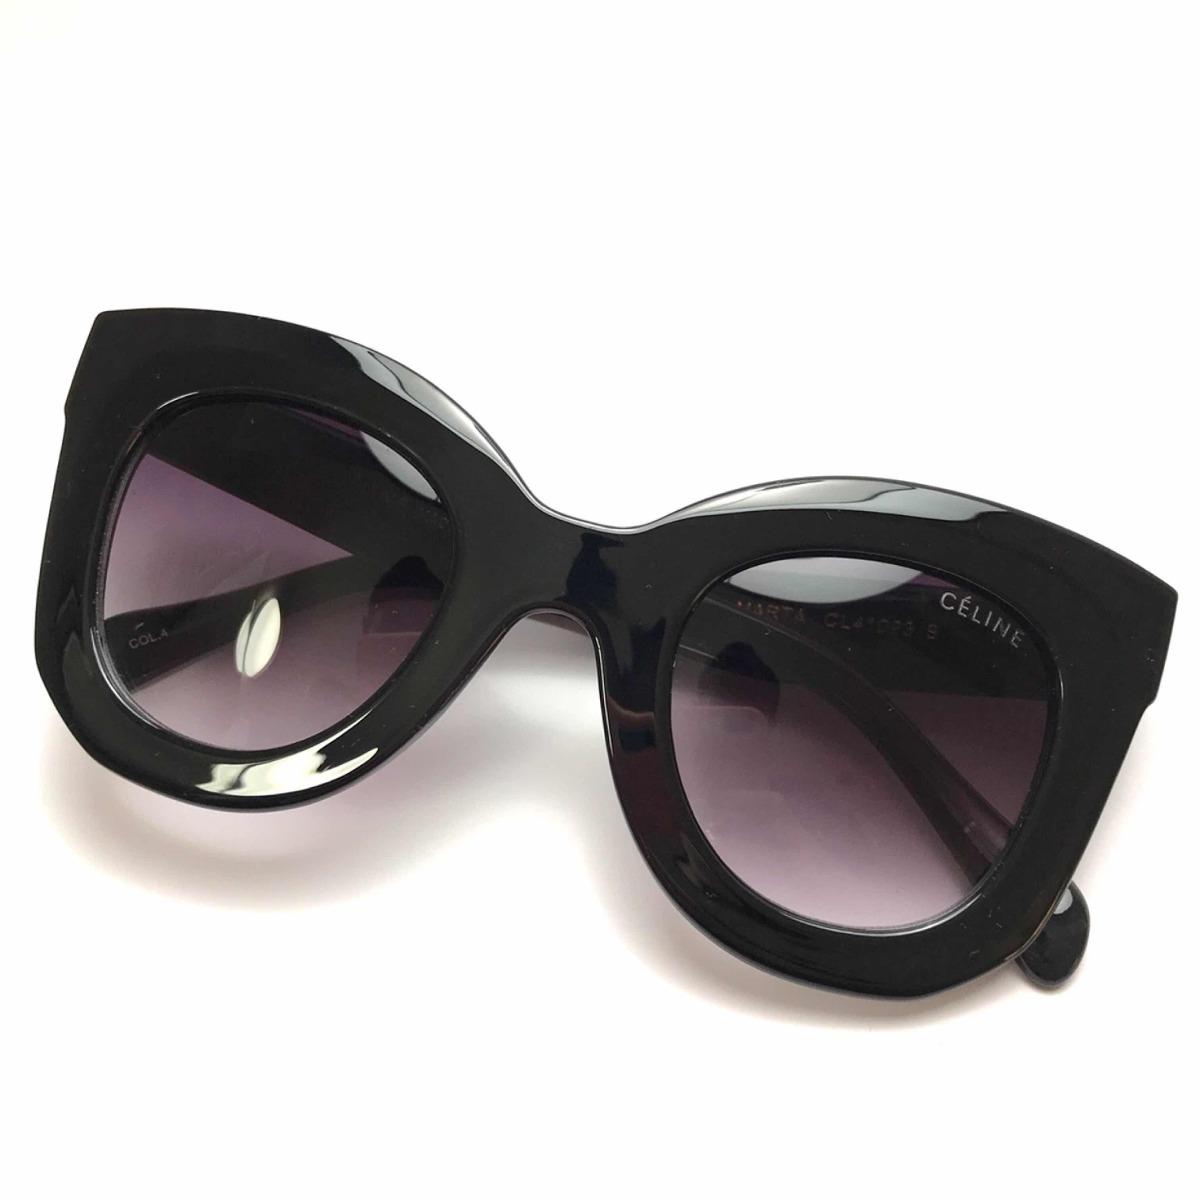 Óculos De Sol Companha Promocional Black Friday - R  89,00 em ... effa60c0bf